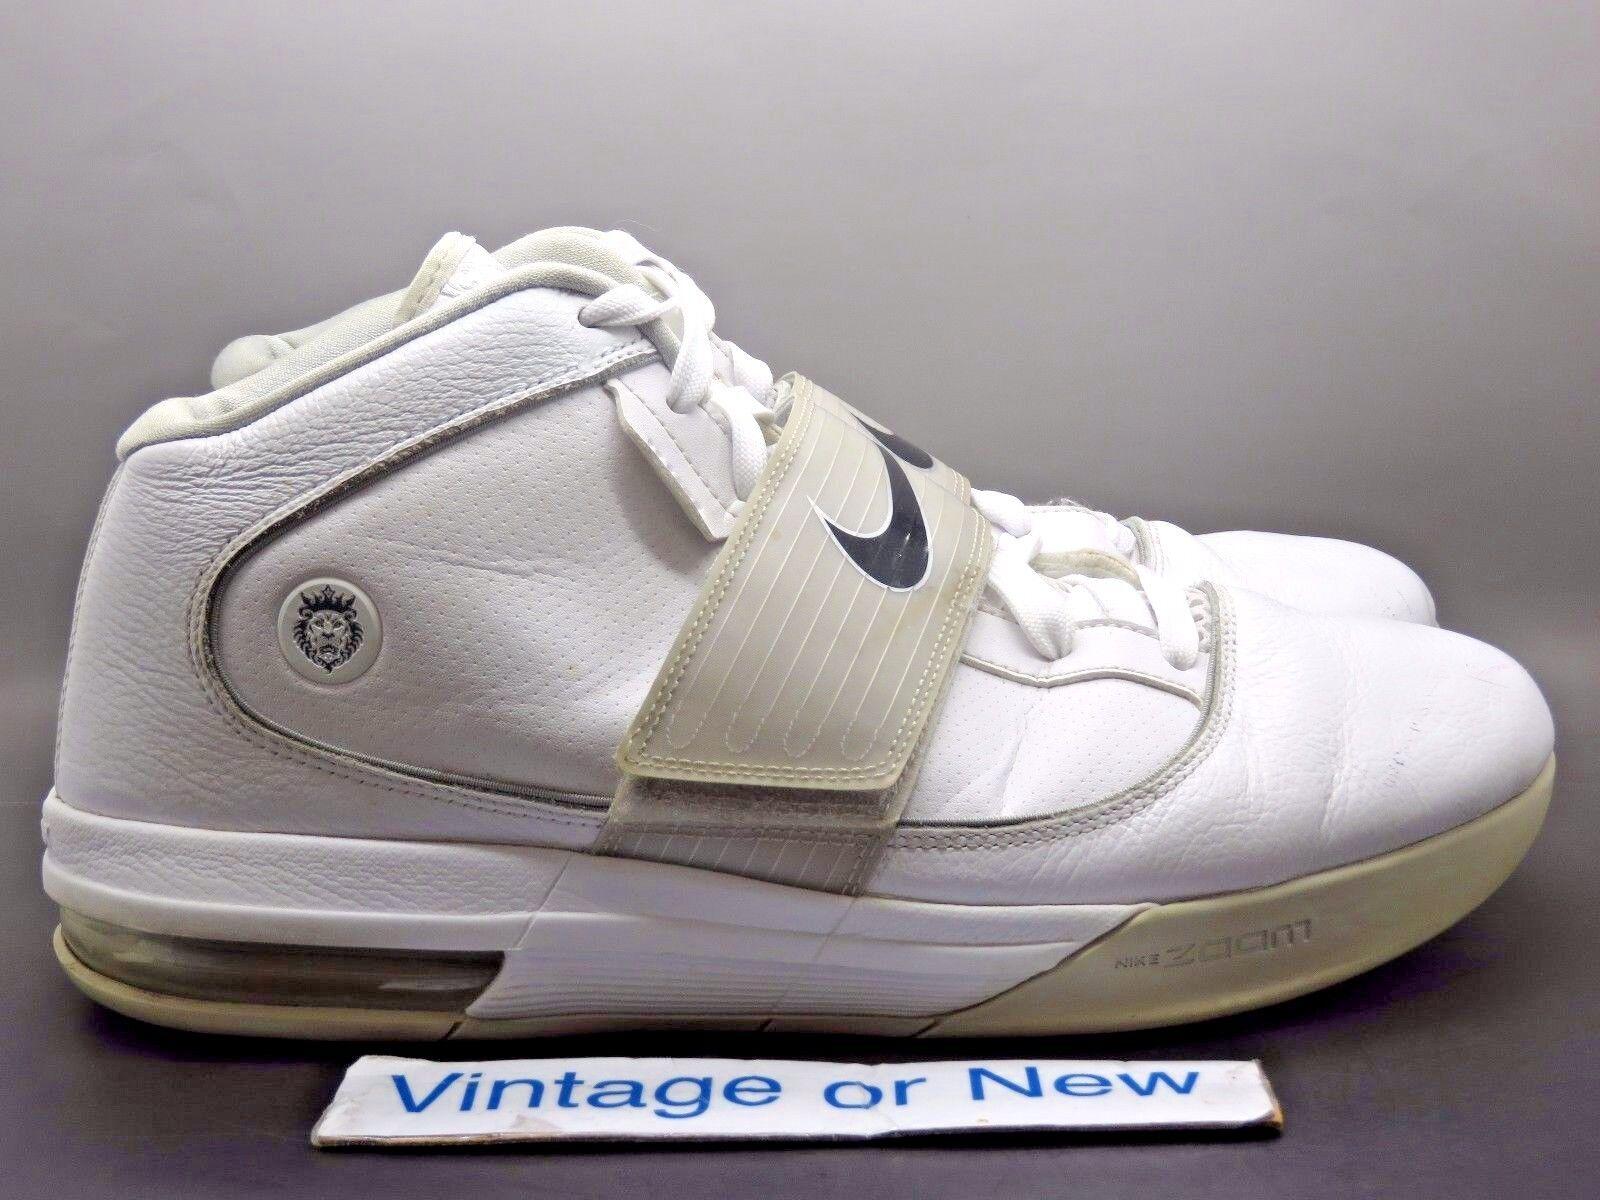 Nike Zoom Soldier IV 4 TB LeBron White Silver Black 2010 sz 13